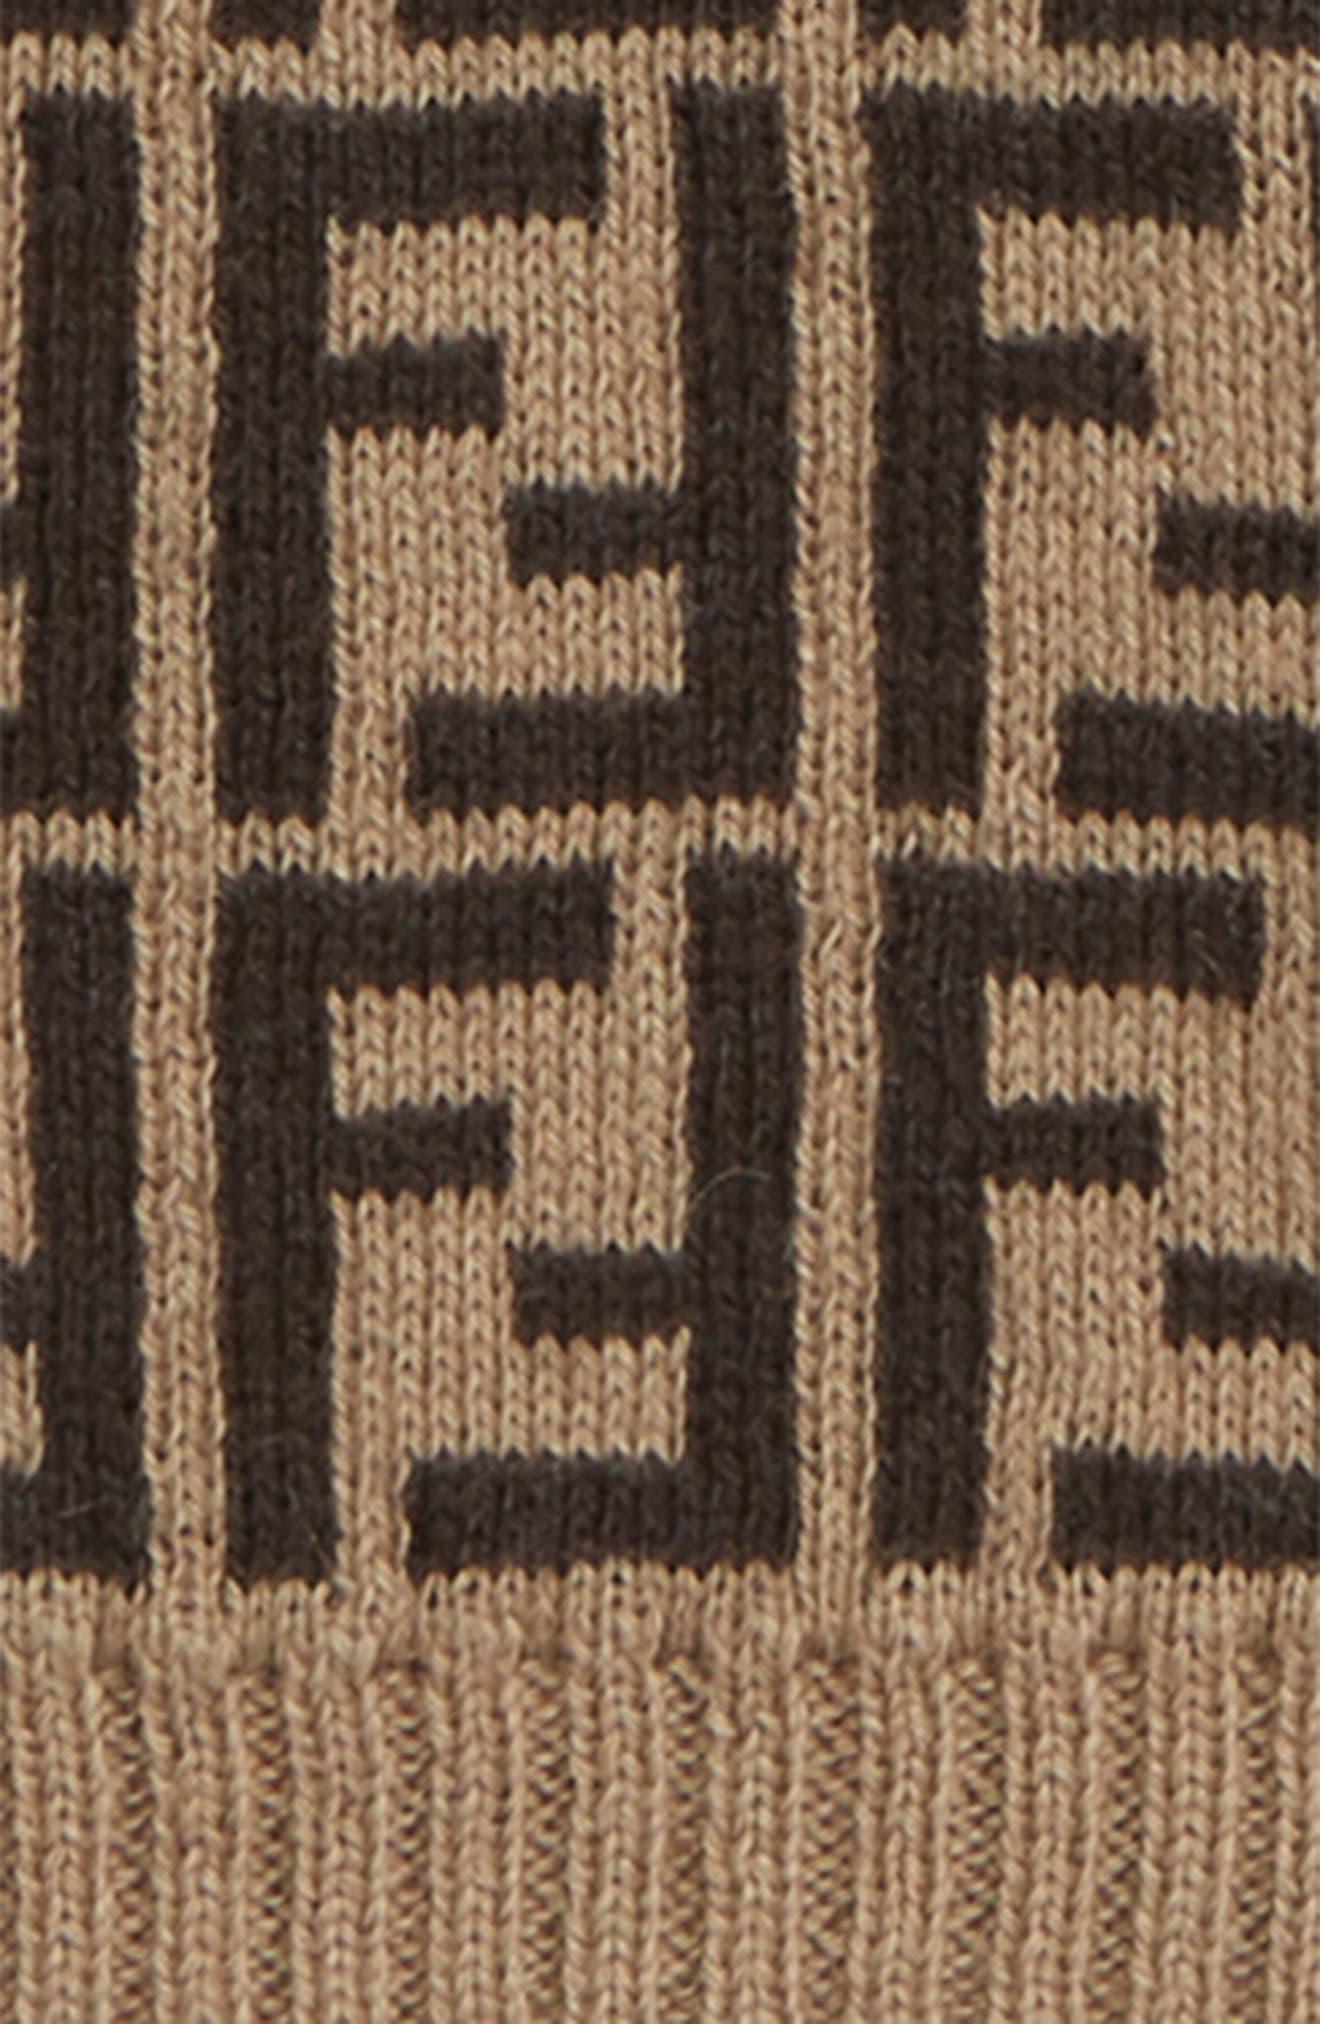 FENDI,                             Logo Sweater,                             Alternate thumbnail 2, color,                             F0LMJ BROWN